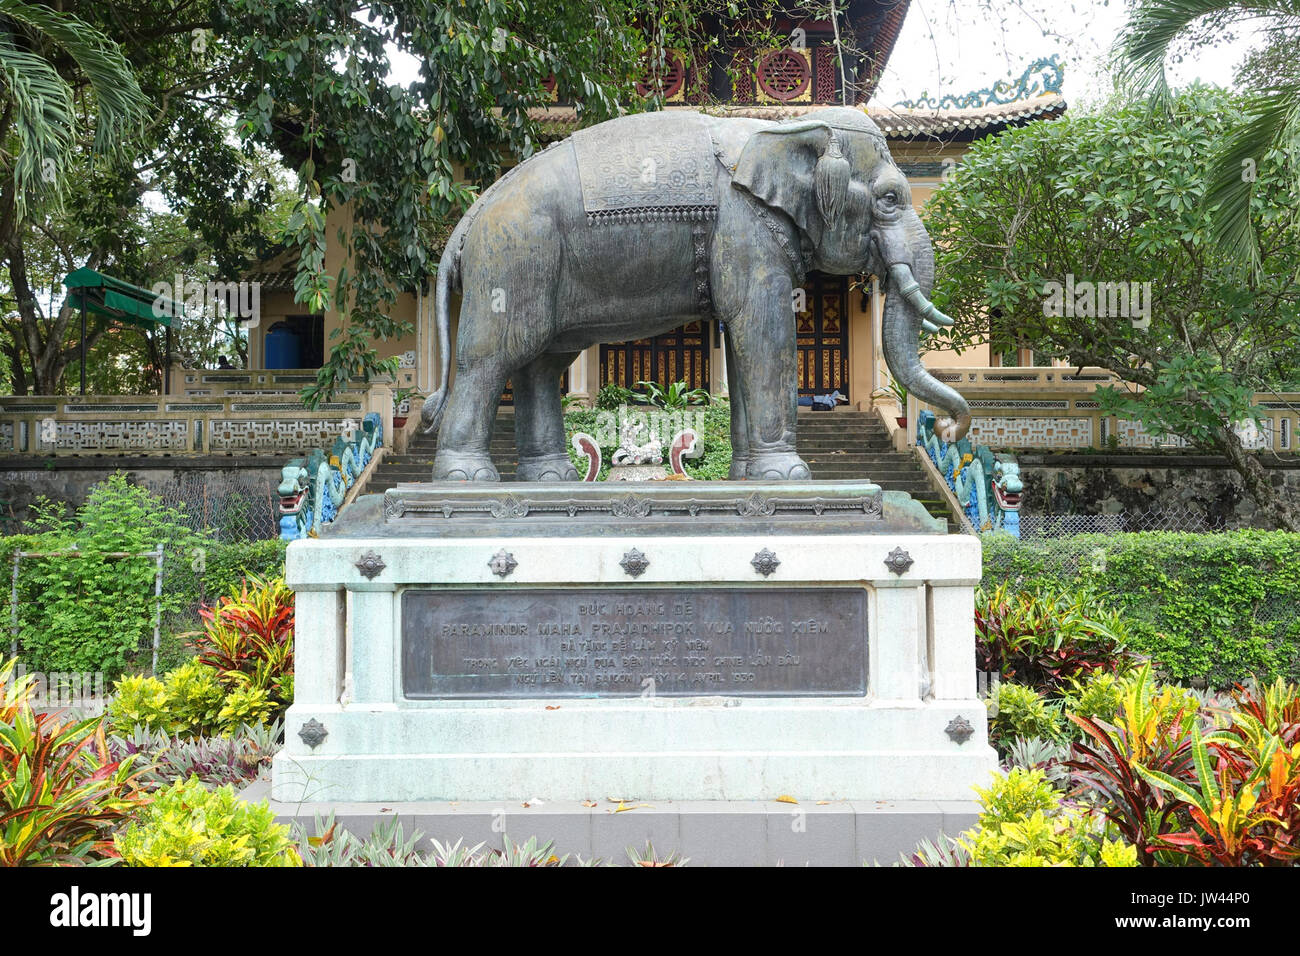 Stock Photo - Elephant statue   Saigon Zoo and Botanical Gardens   Ho Chi Minh City, Vietnam   DSC01172